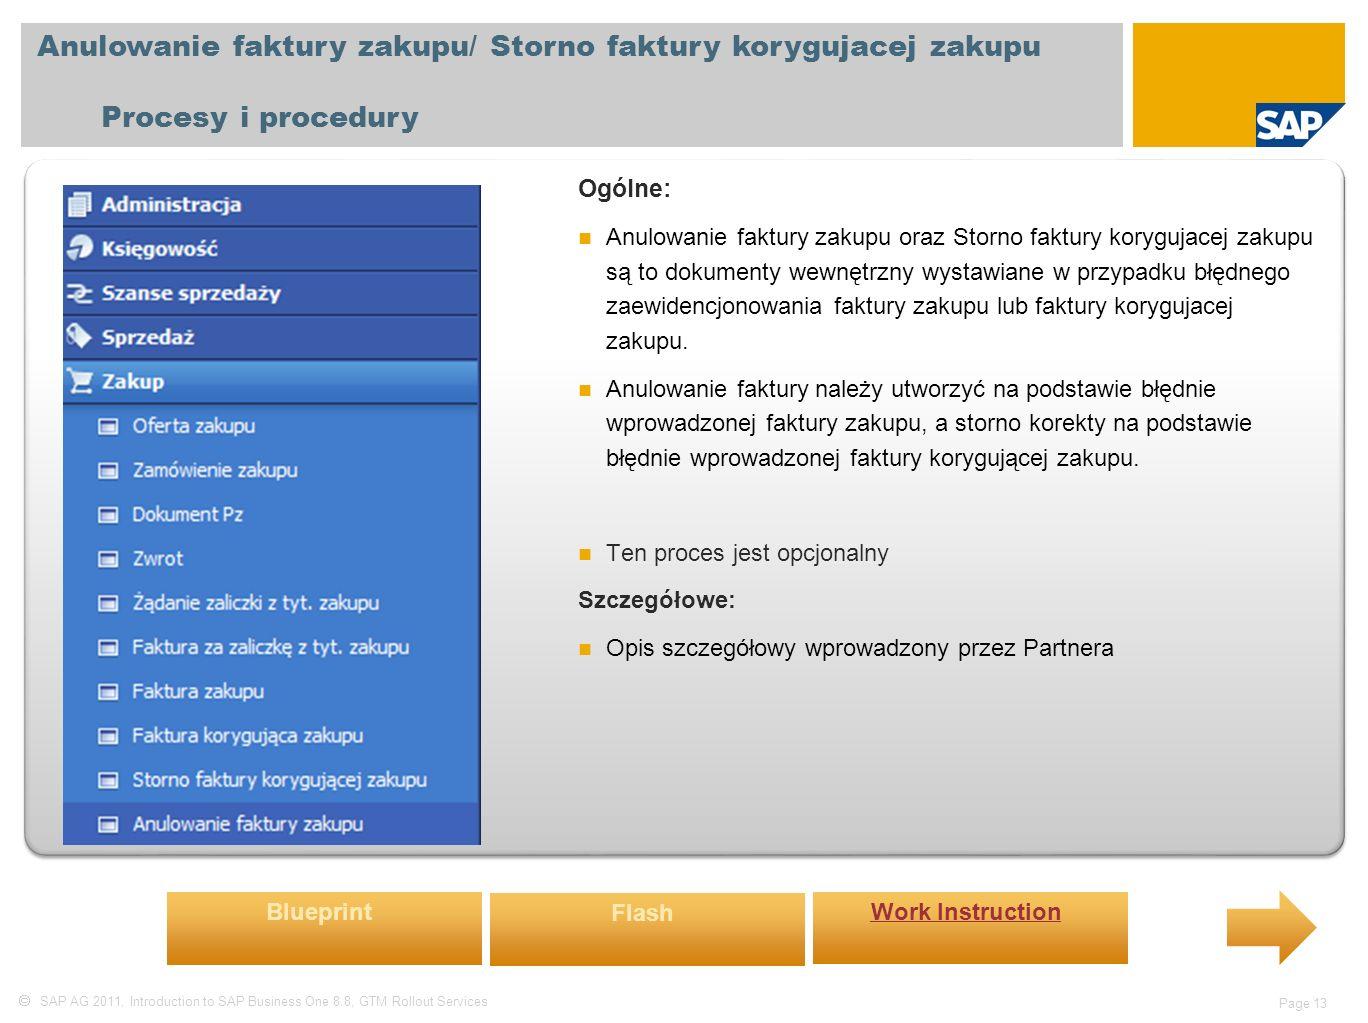  SAP AG 2011, Introduction to SAP Business One 8.8, GTM Rollout Services Page 13 Anulowanie faktury zakupu/ Storno faktury korygujacej zakupu Procesy